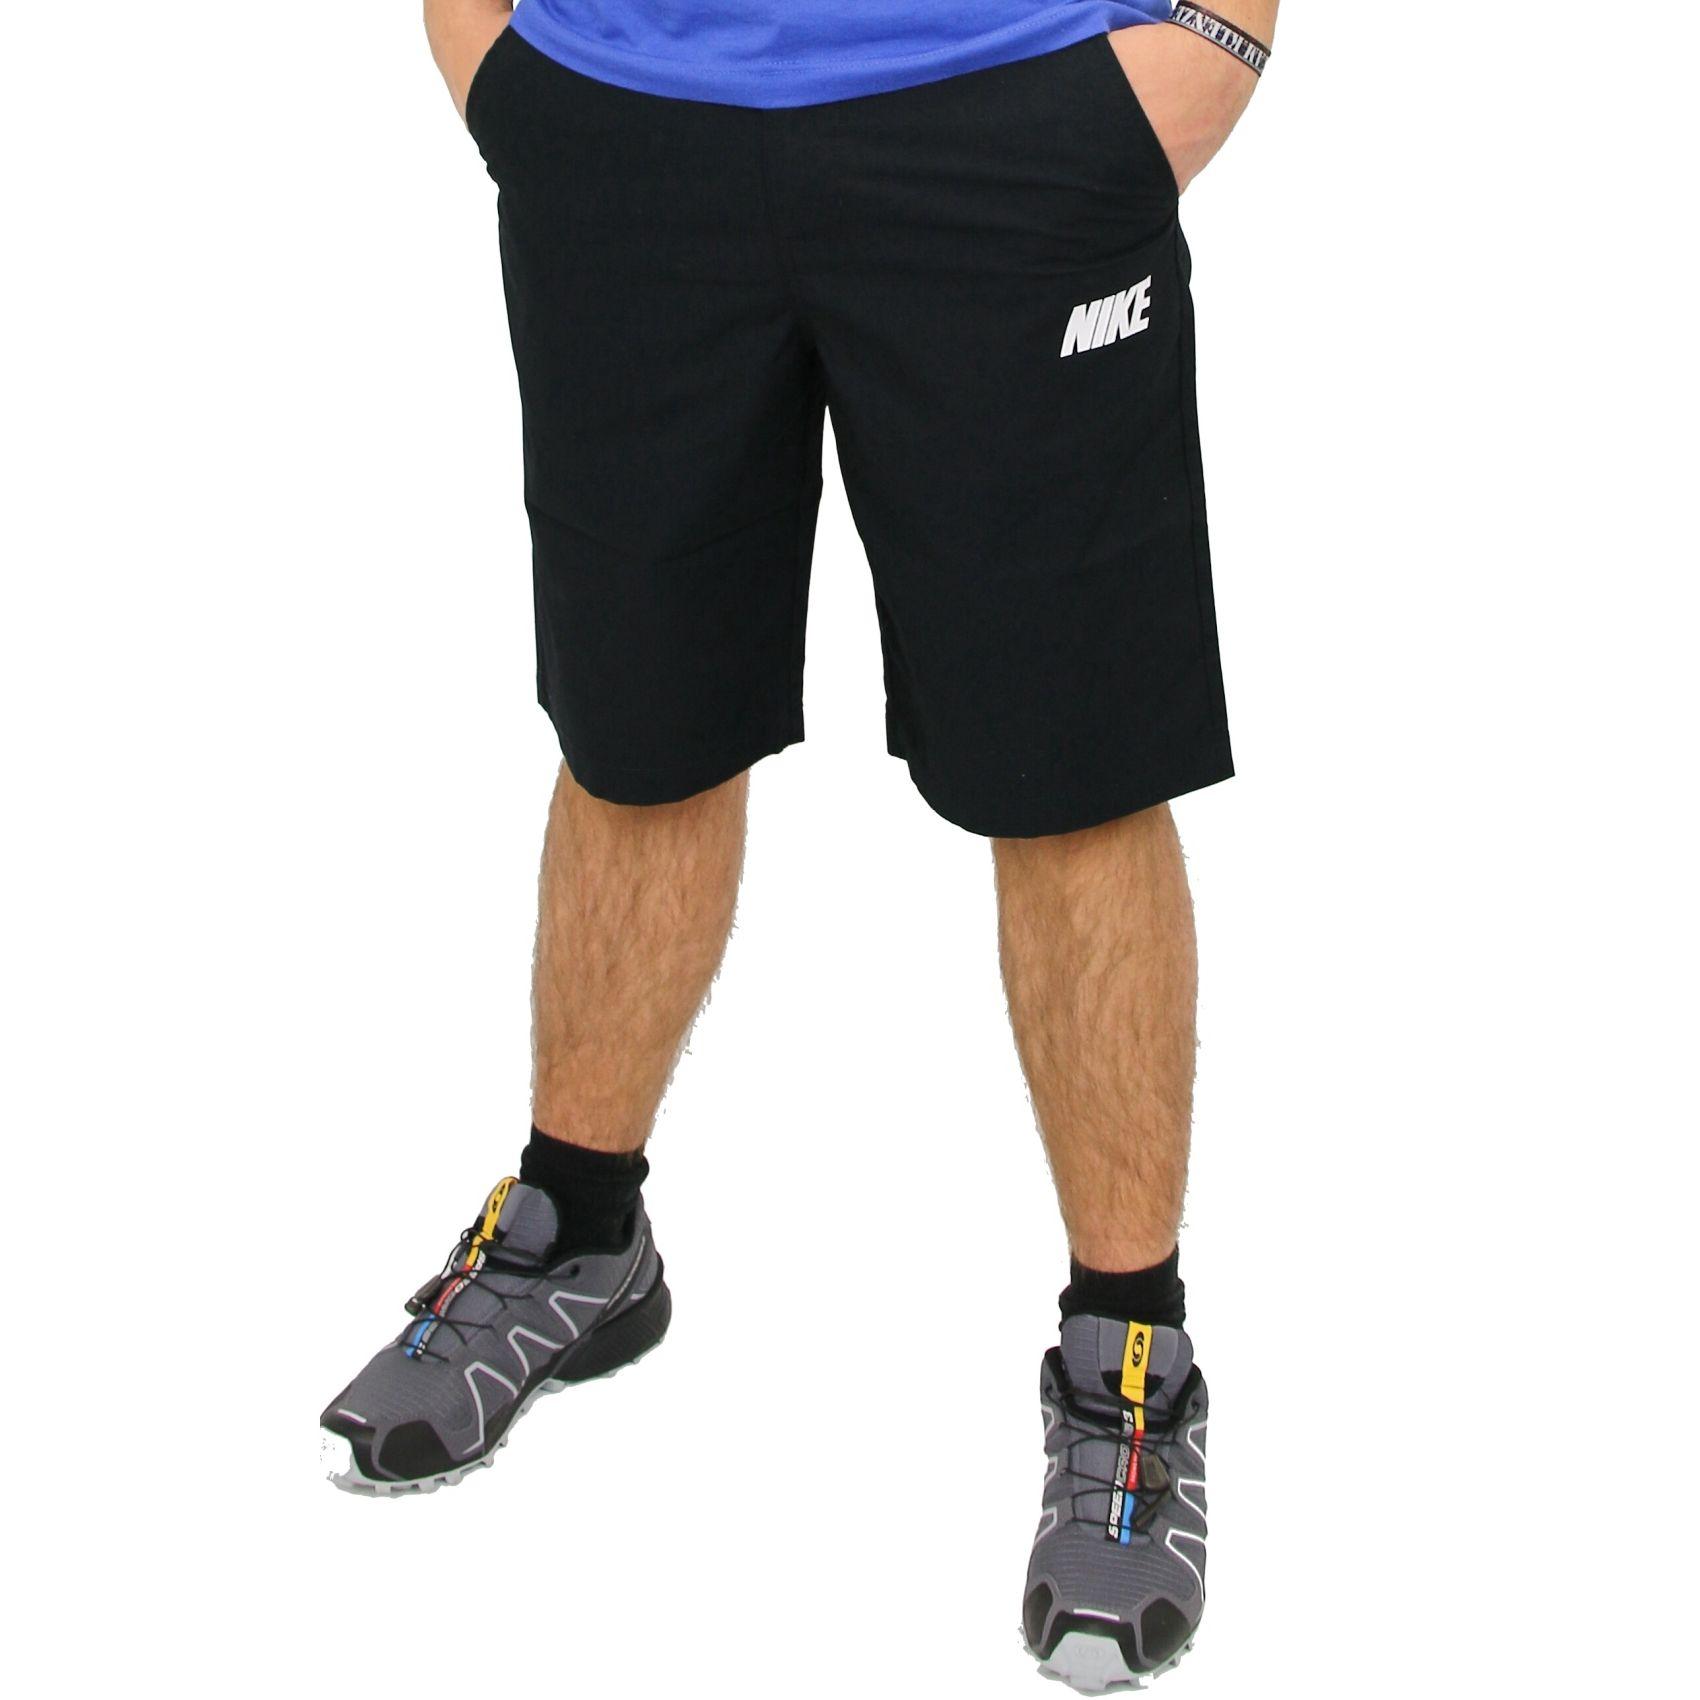 nike basic shorts hose kurz sporthose herren schwarz ebay. Black Bedroom Furniture Sets. Home Design Ideas